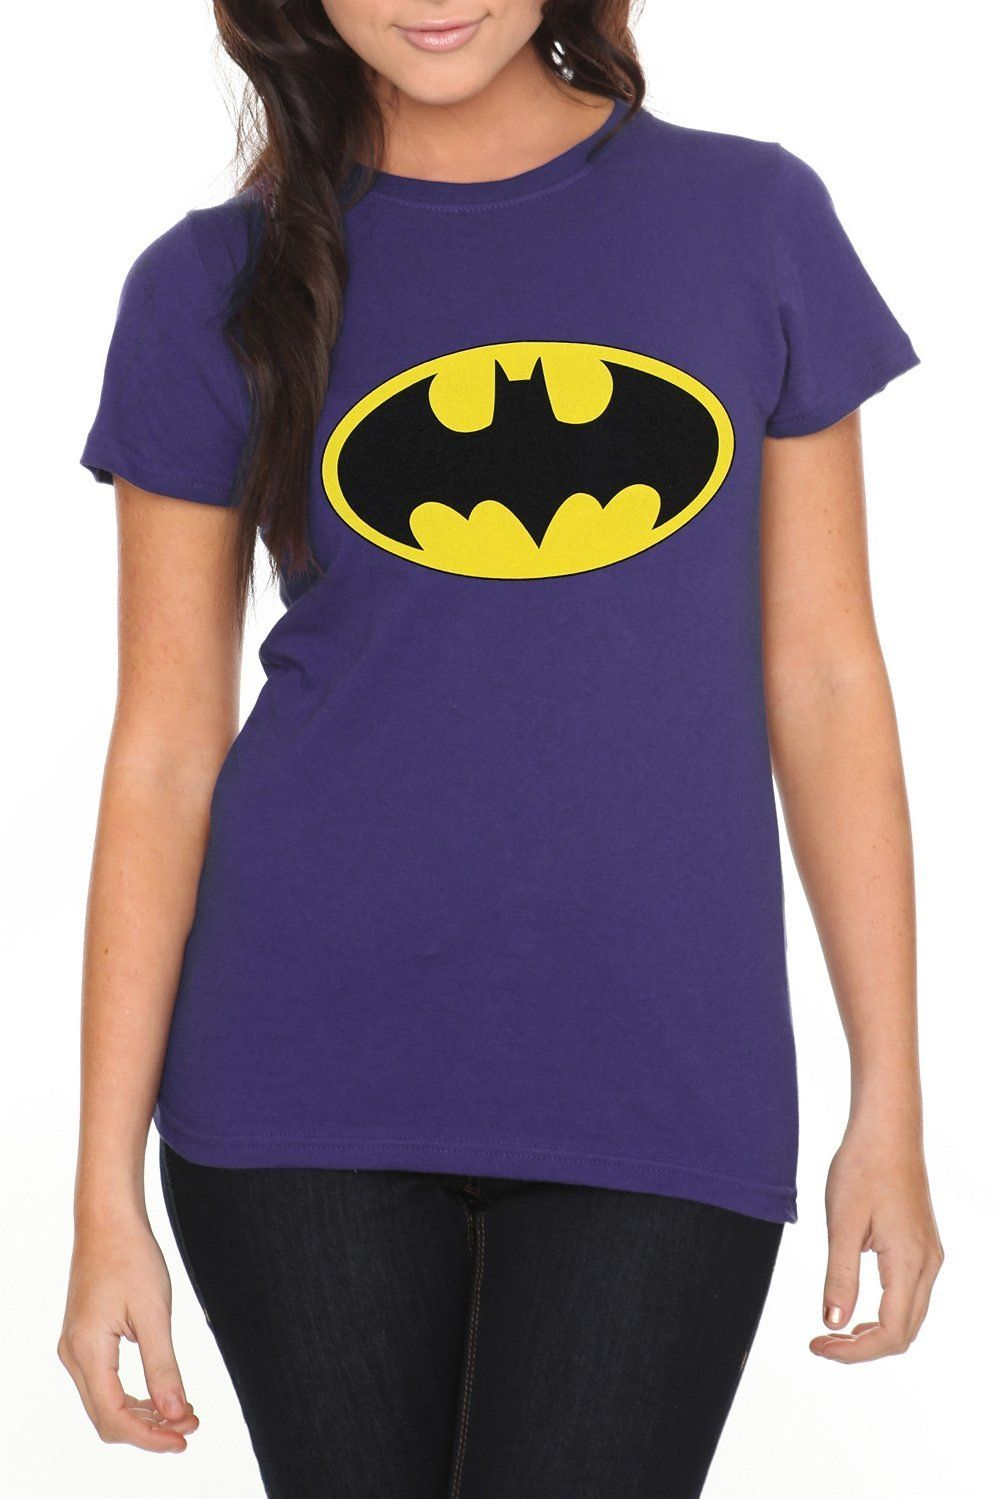 aa0b23b7 DC Comics Batman Logo Purple Girls T-Shirt | DC Comics | Batman ...